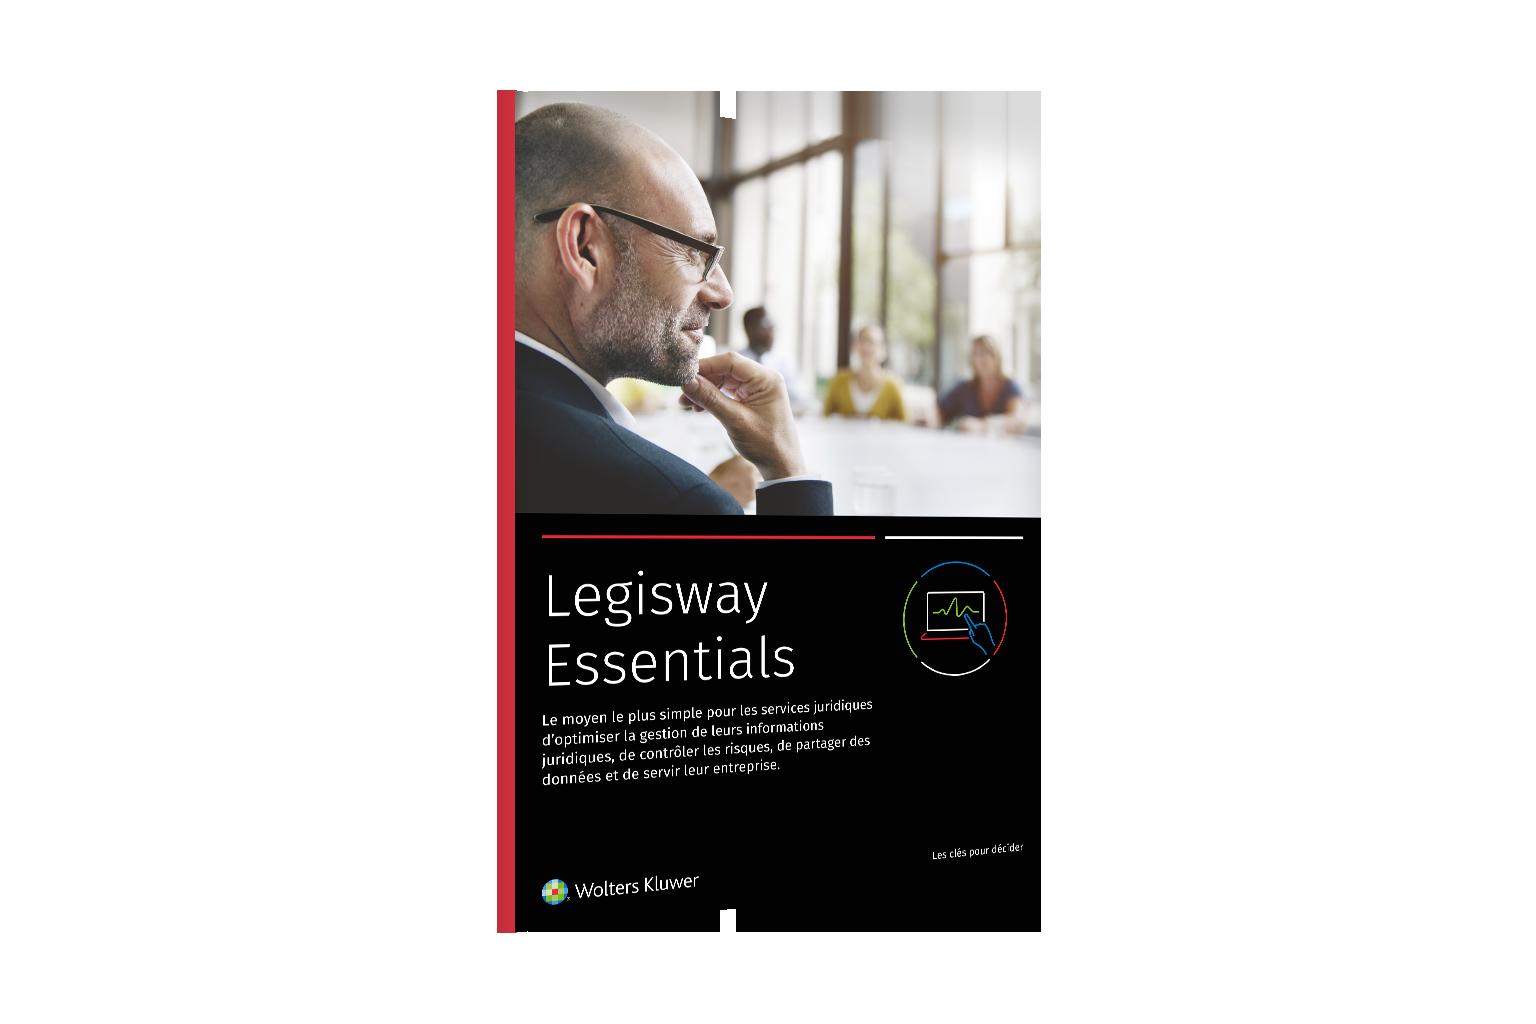 Legisway-Brochure-FR-1536x1024